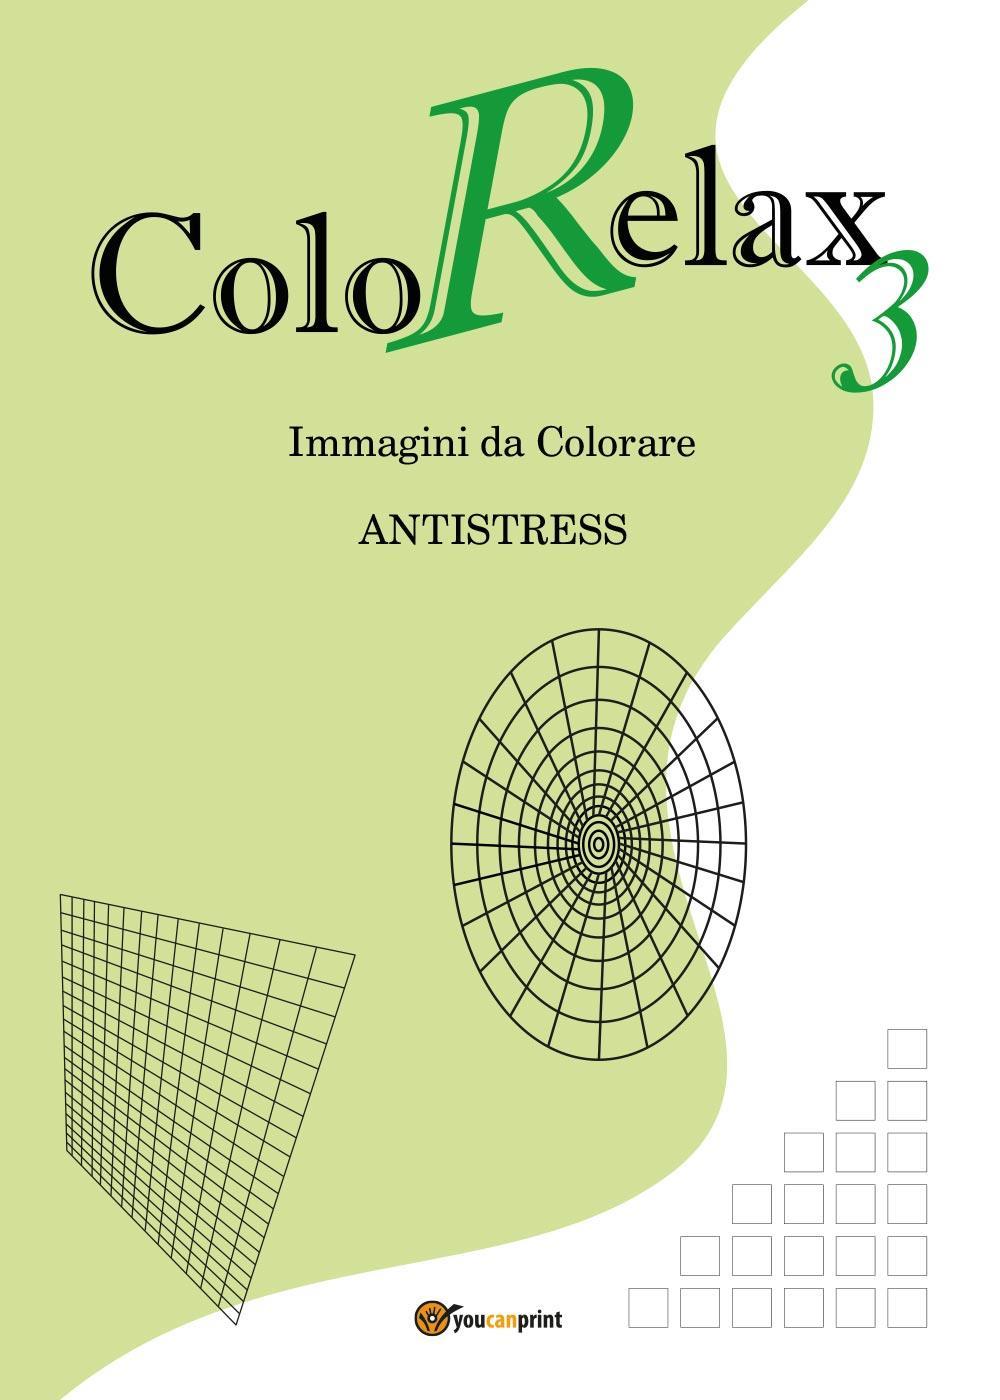 ColoRelax 3